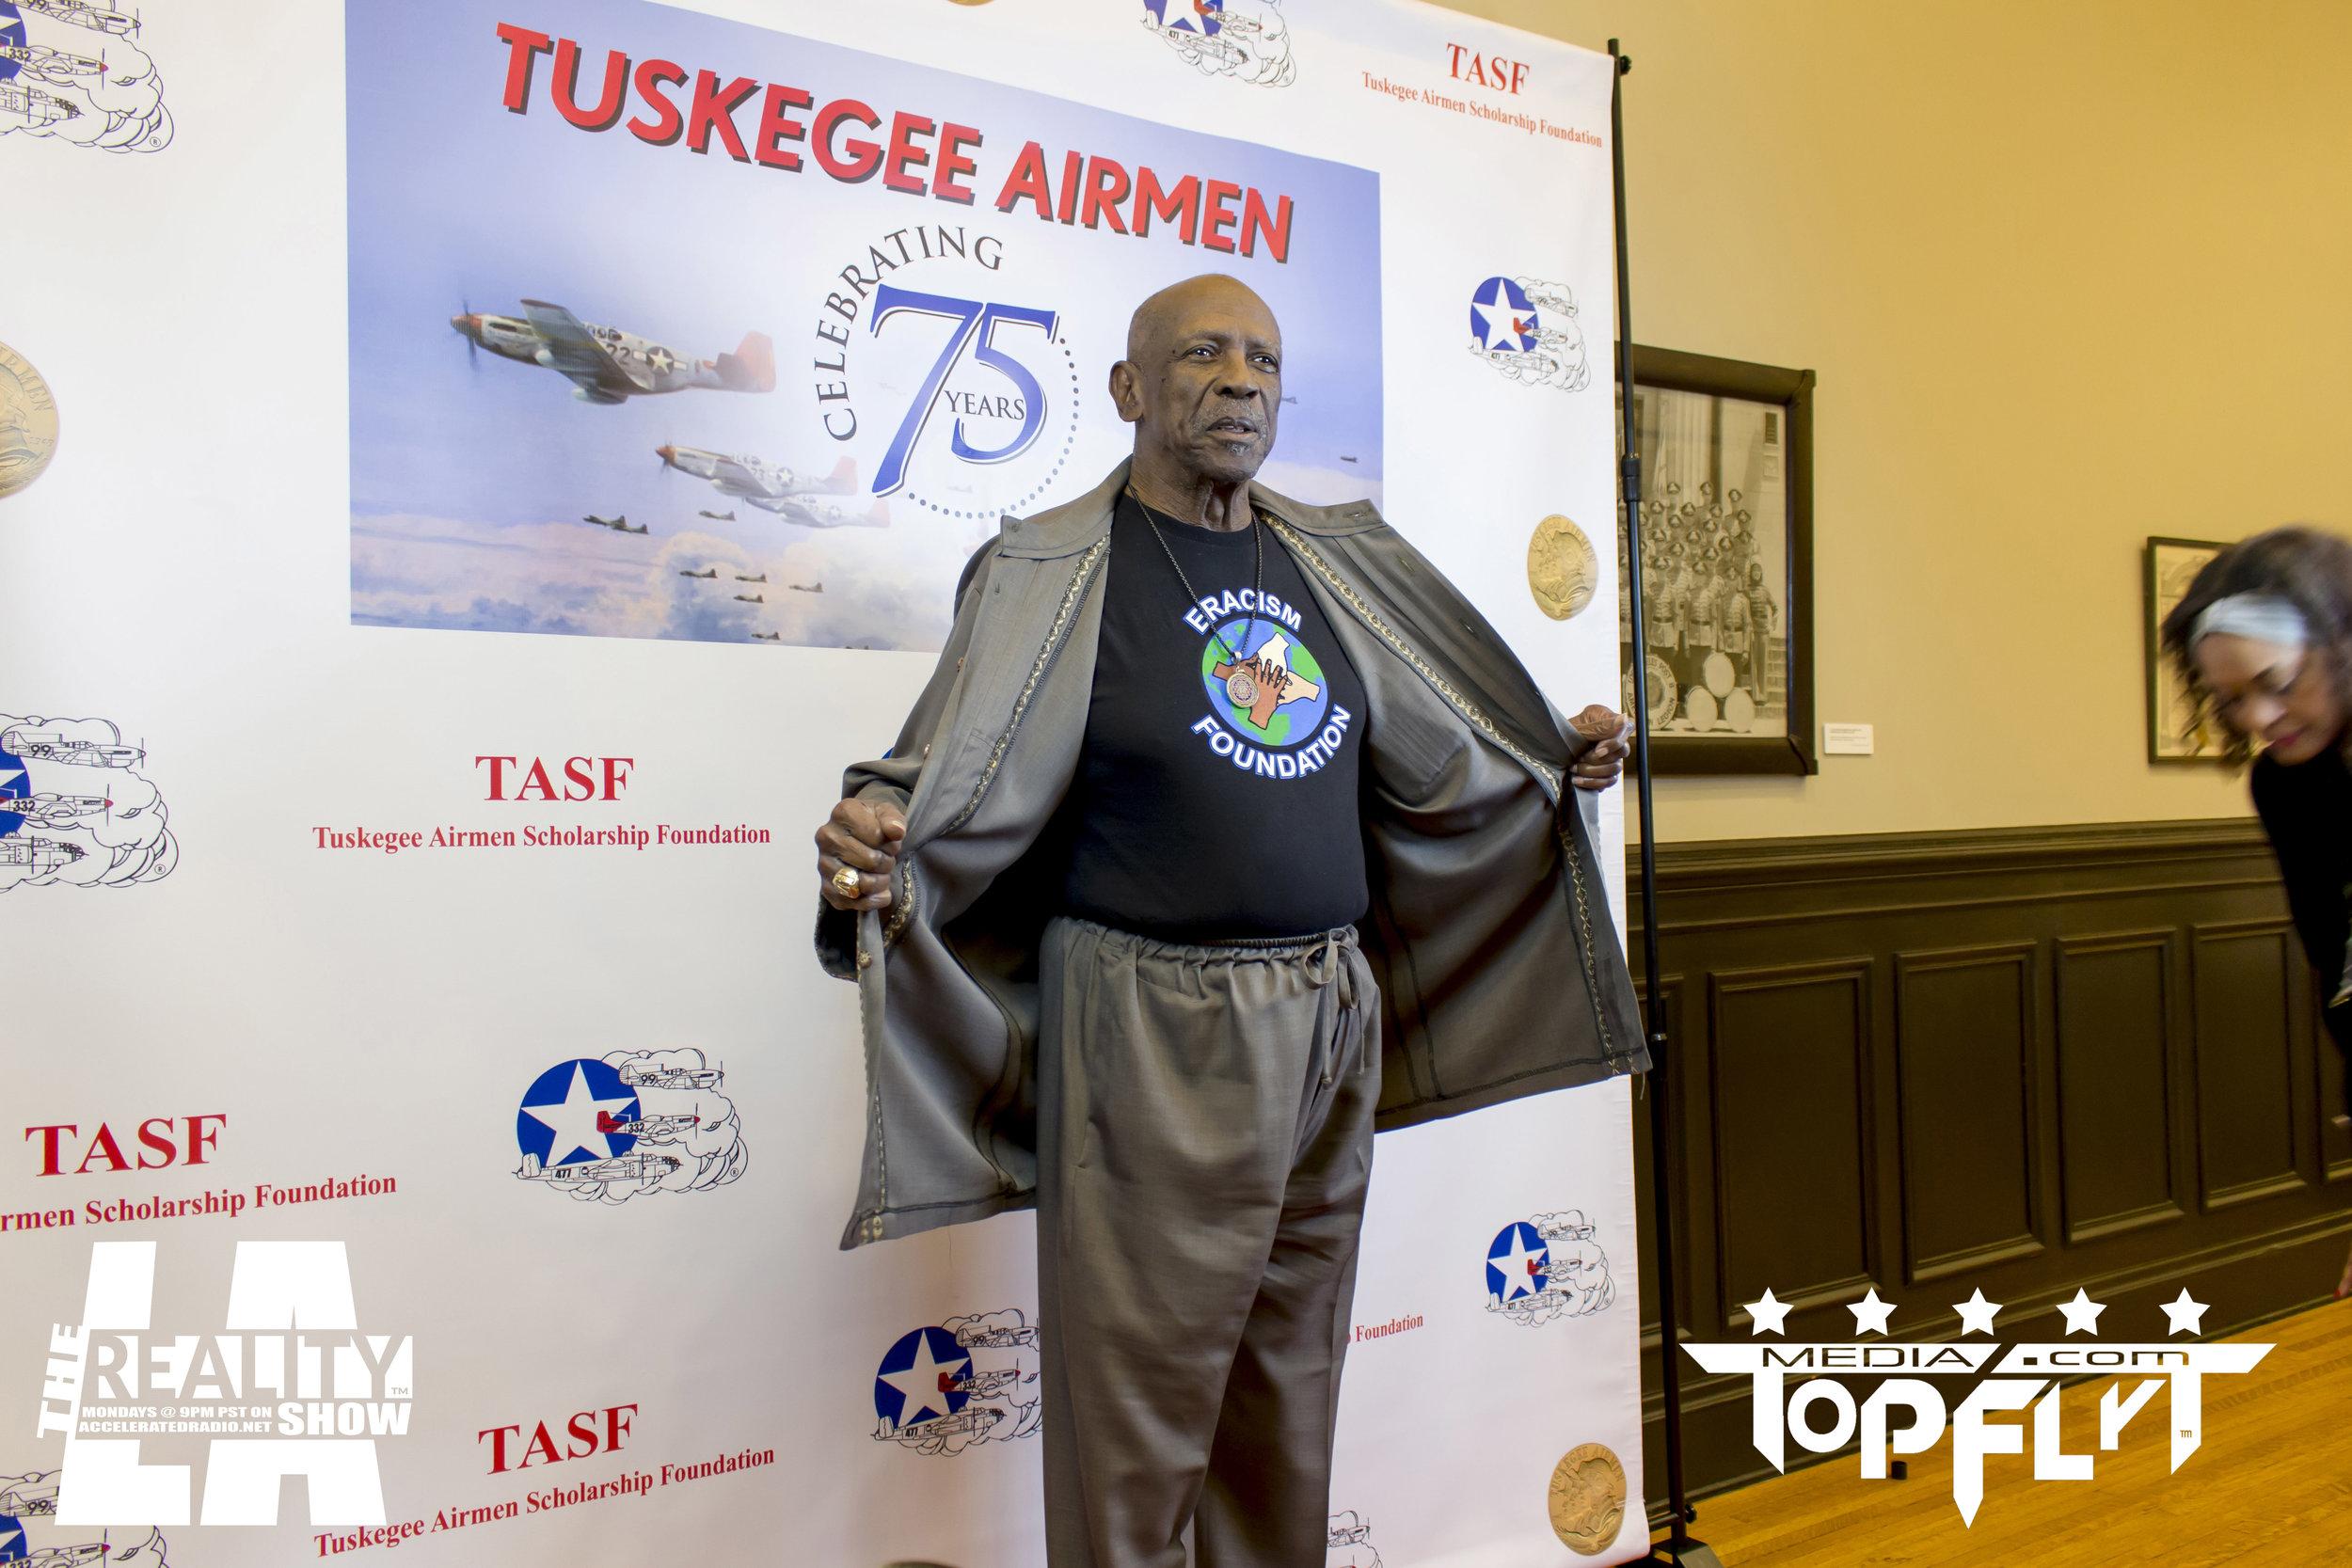 The Reality Show LA - Tuskegee Airmen 75th Anniversary VIP Reception_151.jpg